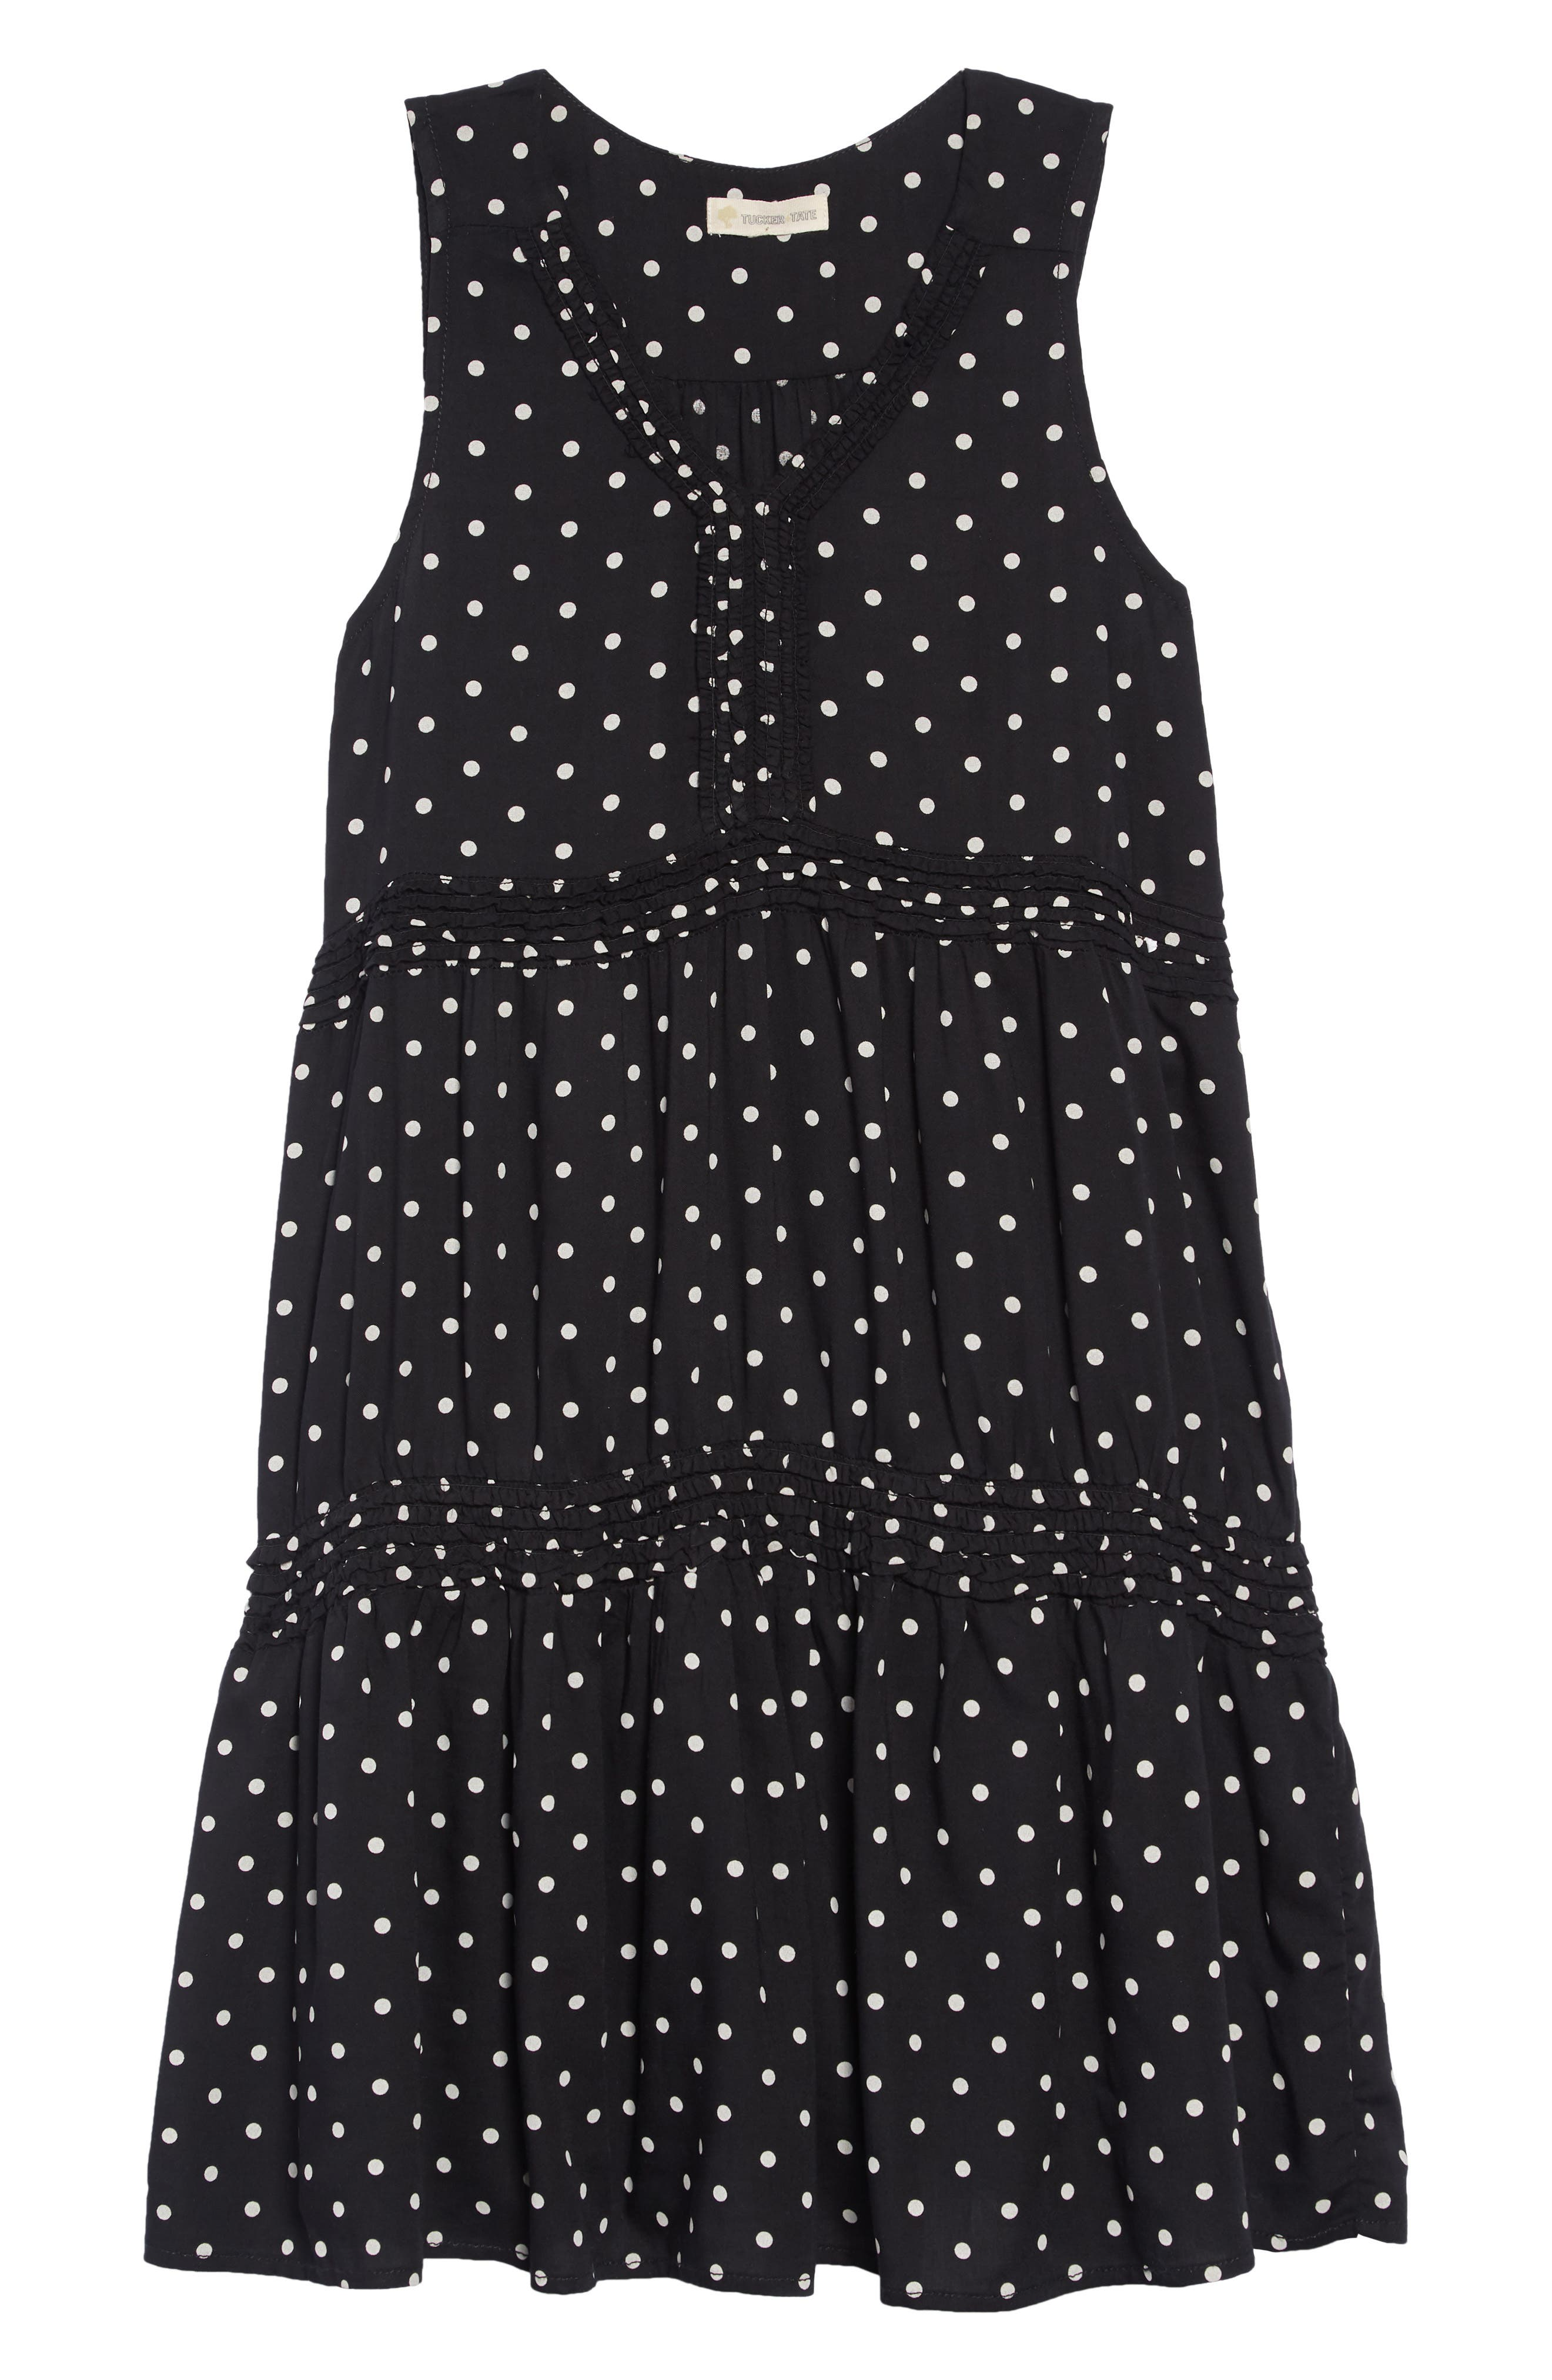 Tiered Print Dress,                             Main thumbnail 1, color,                             BLACK- WHITE DOT